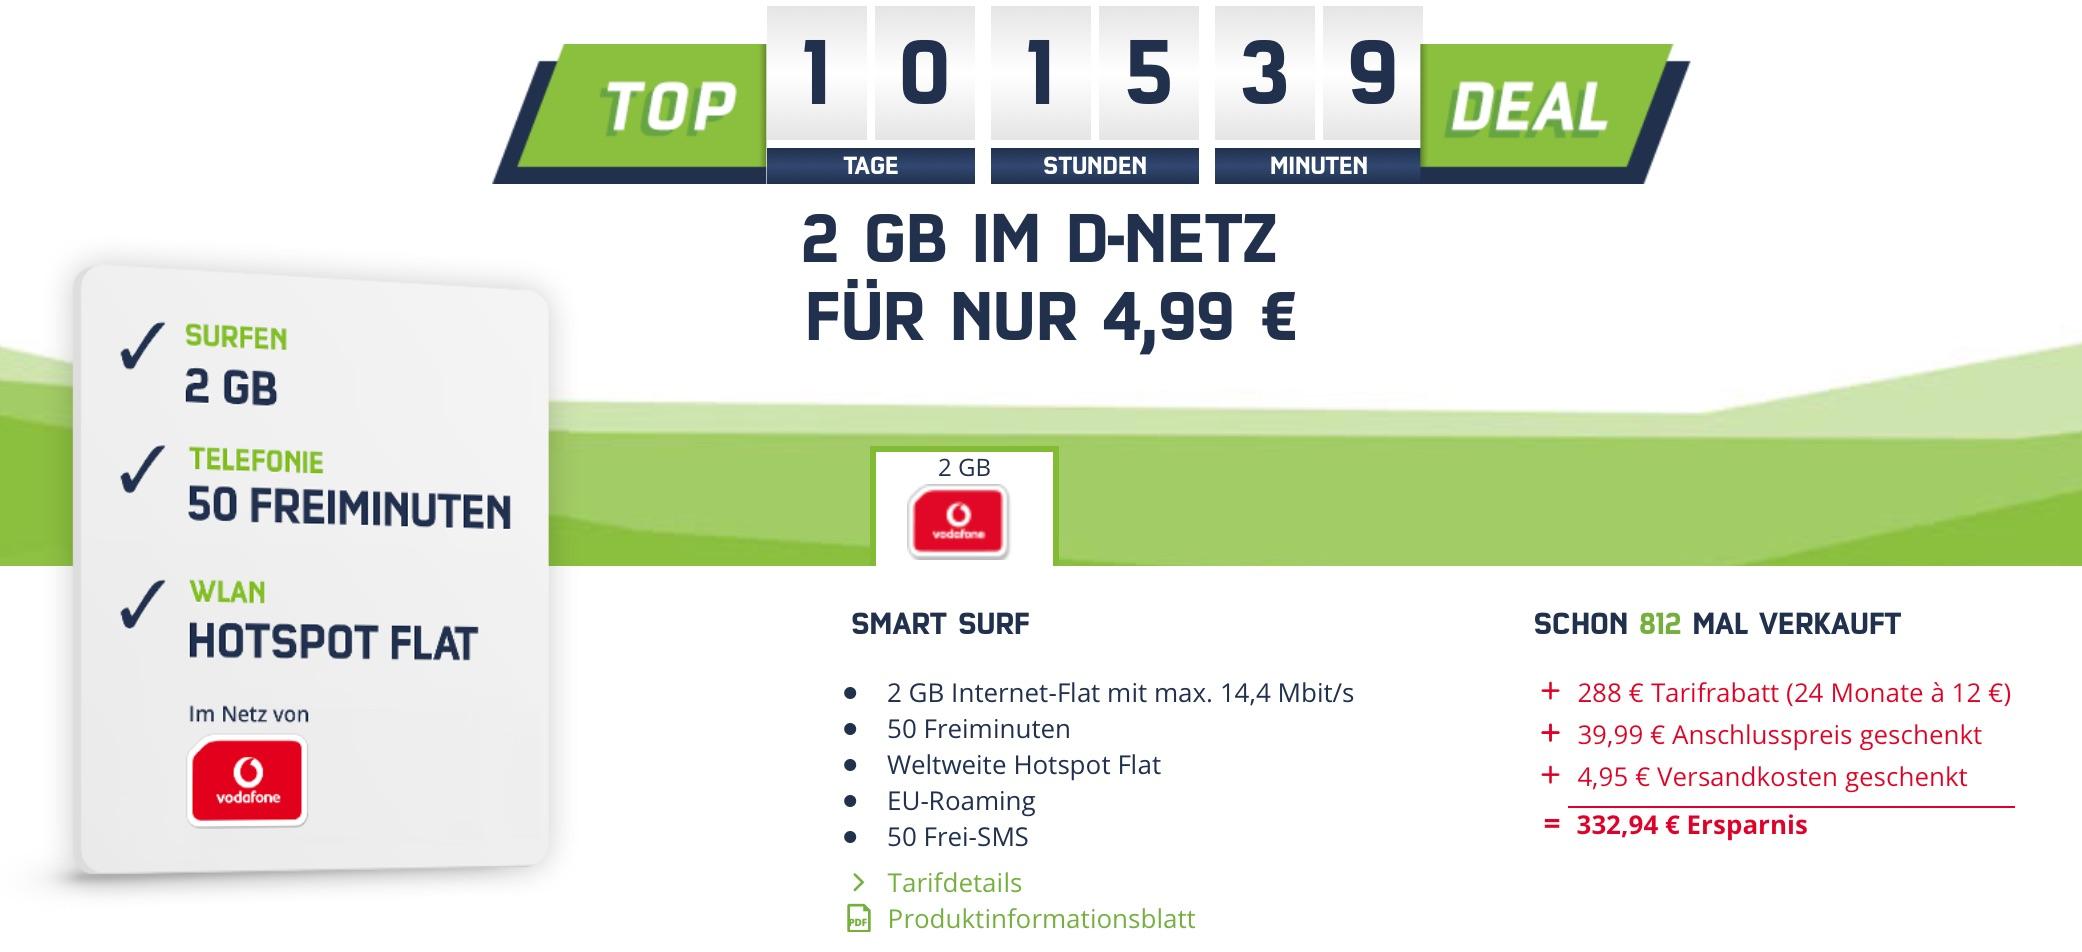 2gb internet flat 50 freiminuten nur 4 99 euro macerkopf. Black Bedroom Furniture Sets. Home Design Ideas